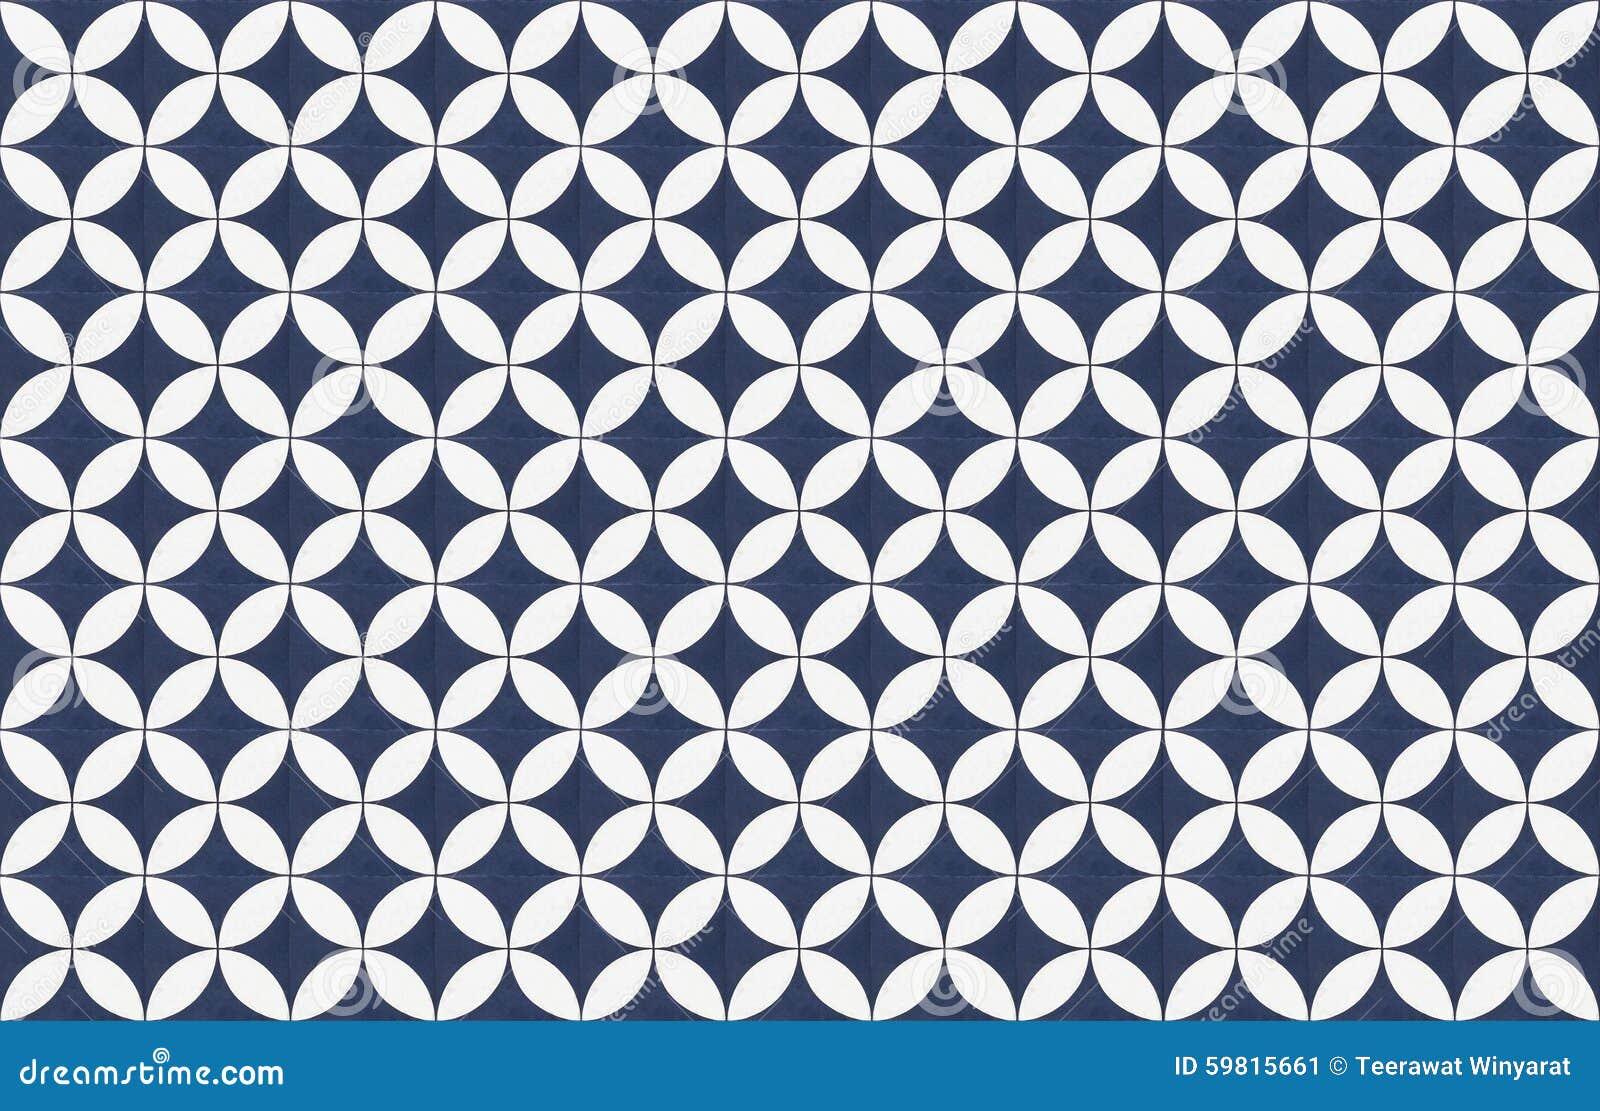 Tiles pattern design geometric mosaic